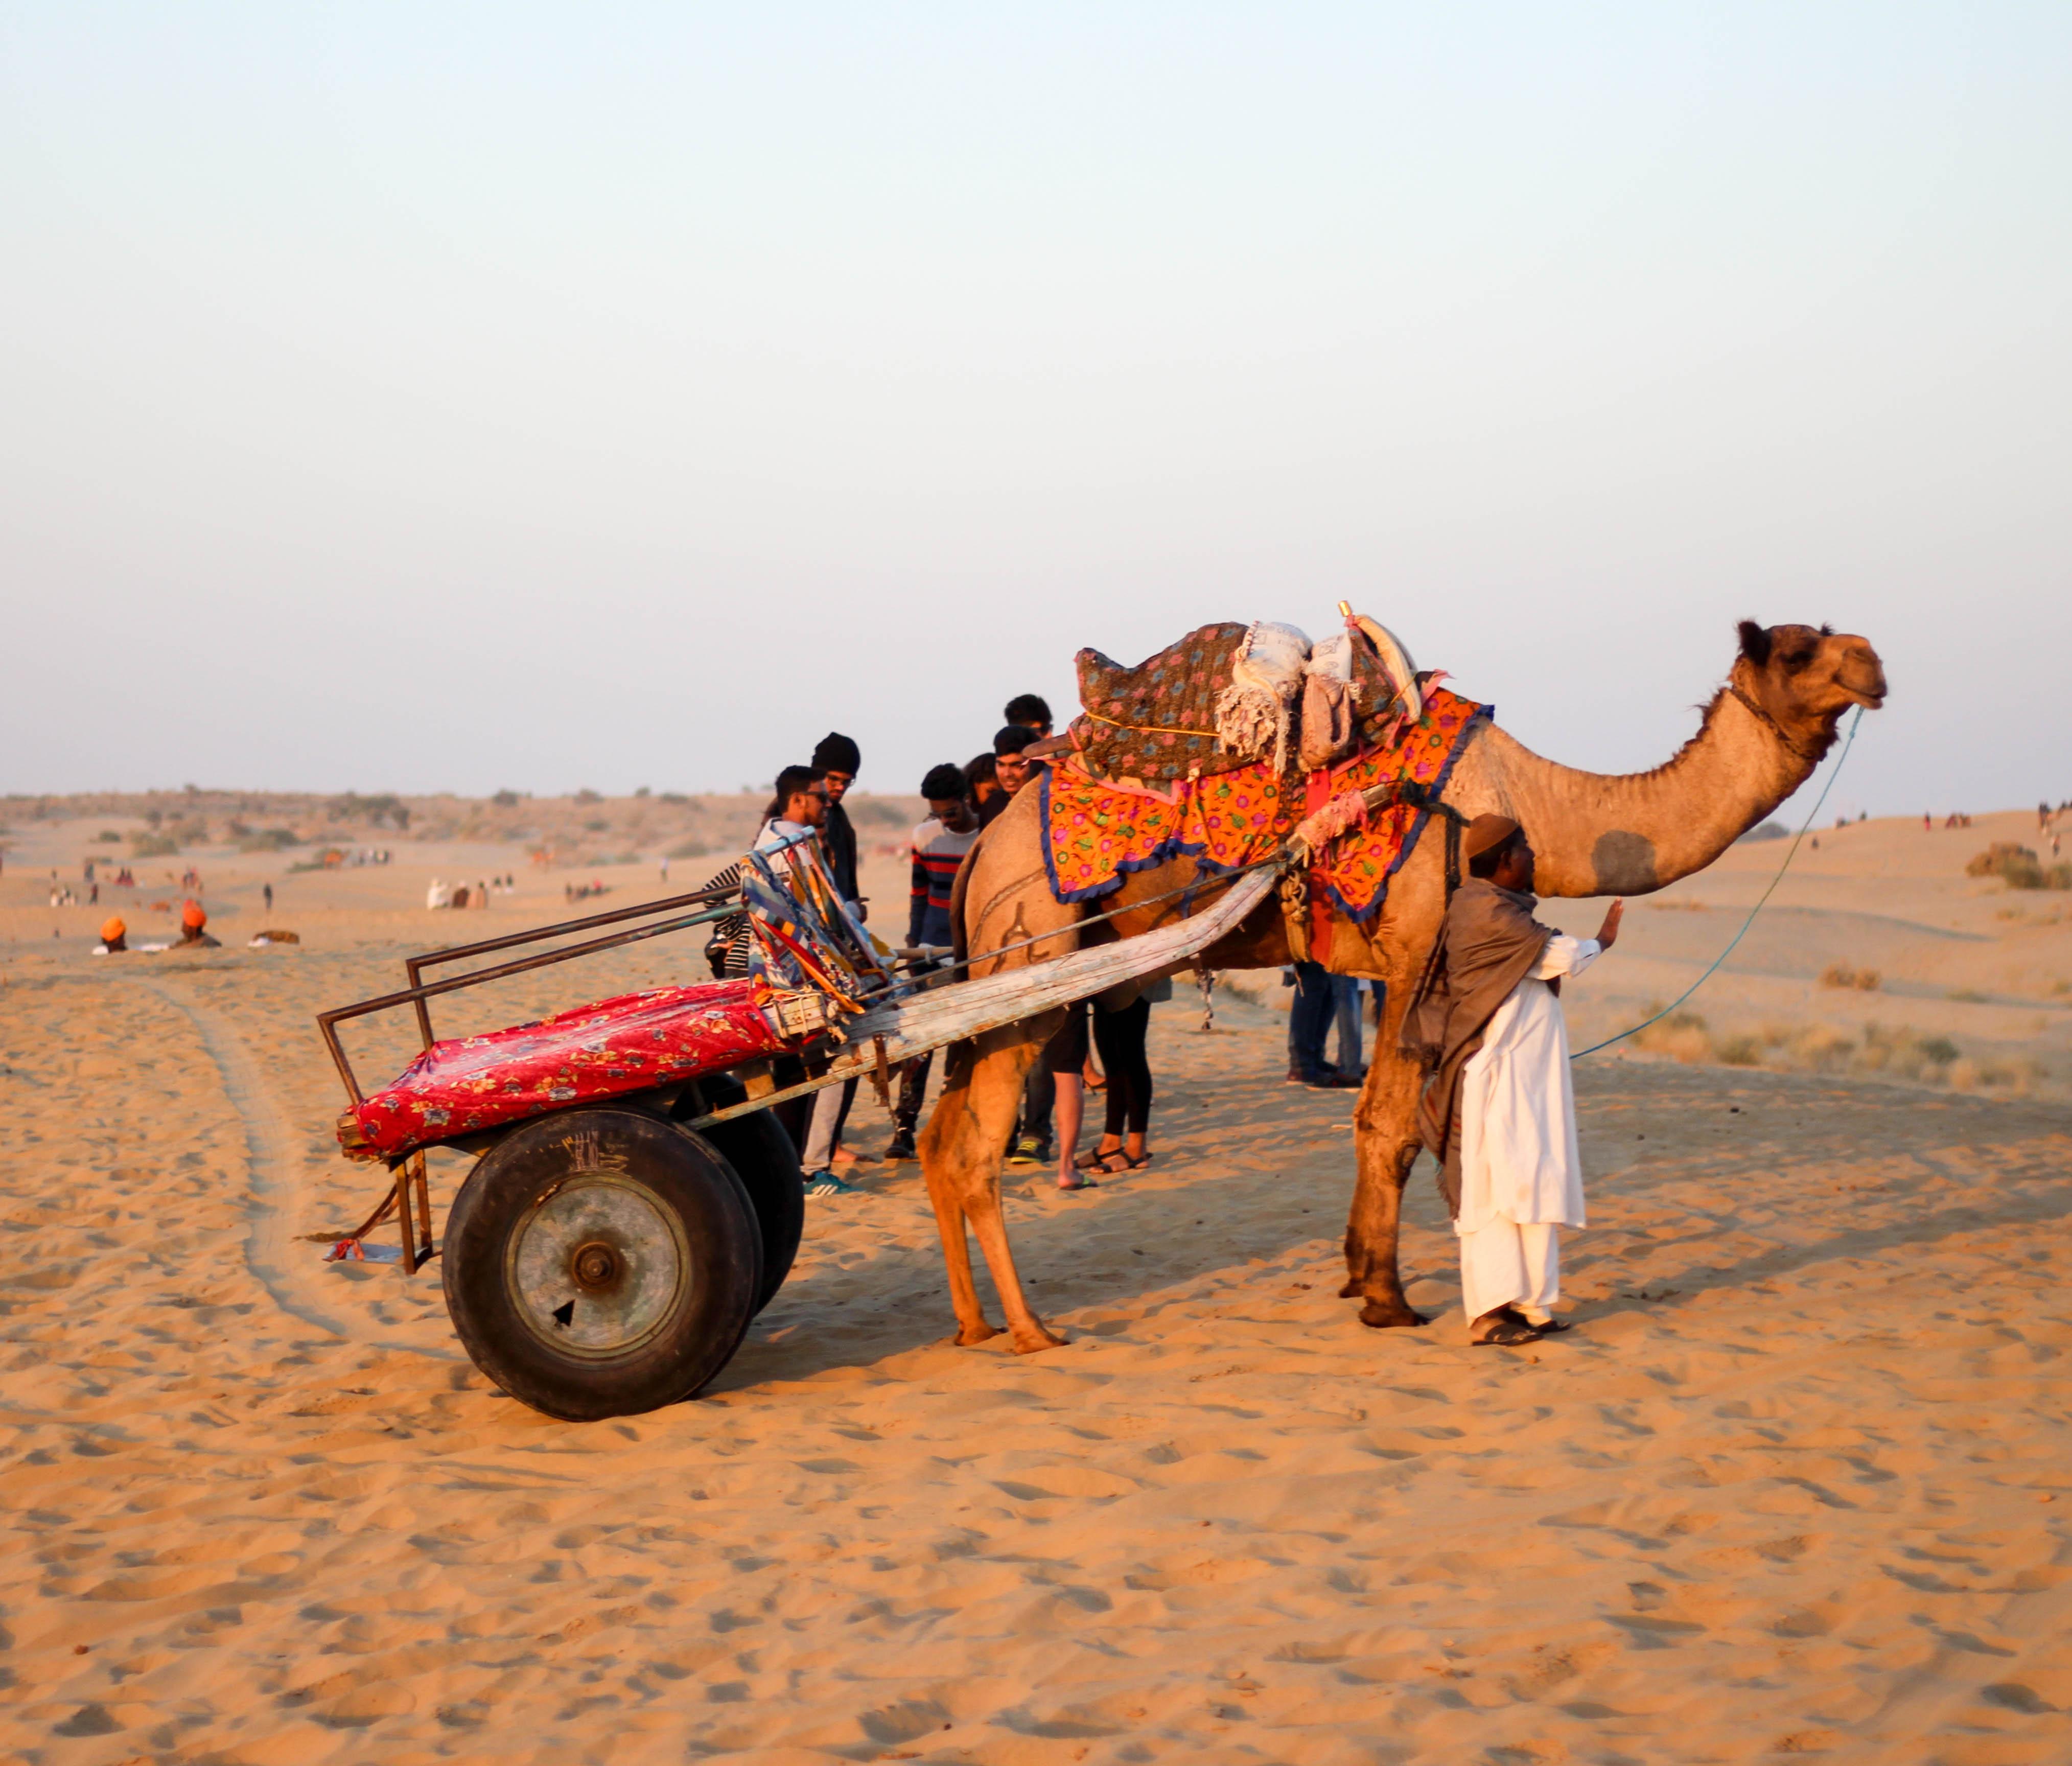 Camel ride at SAM Sand Dunes